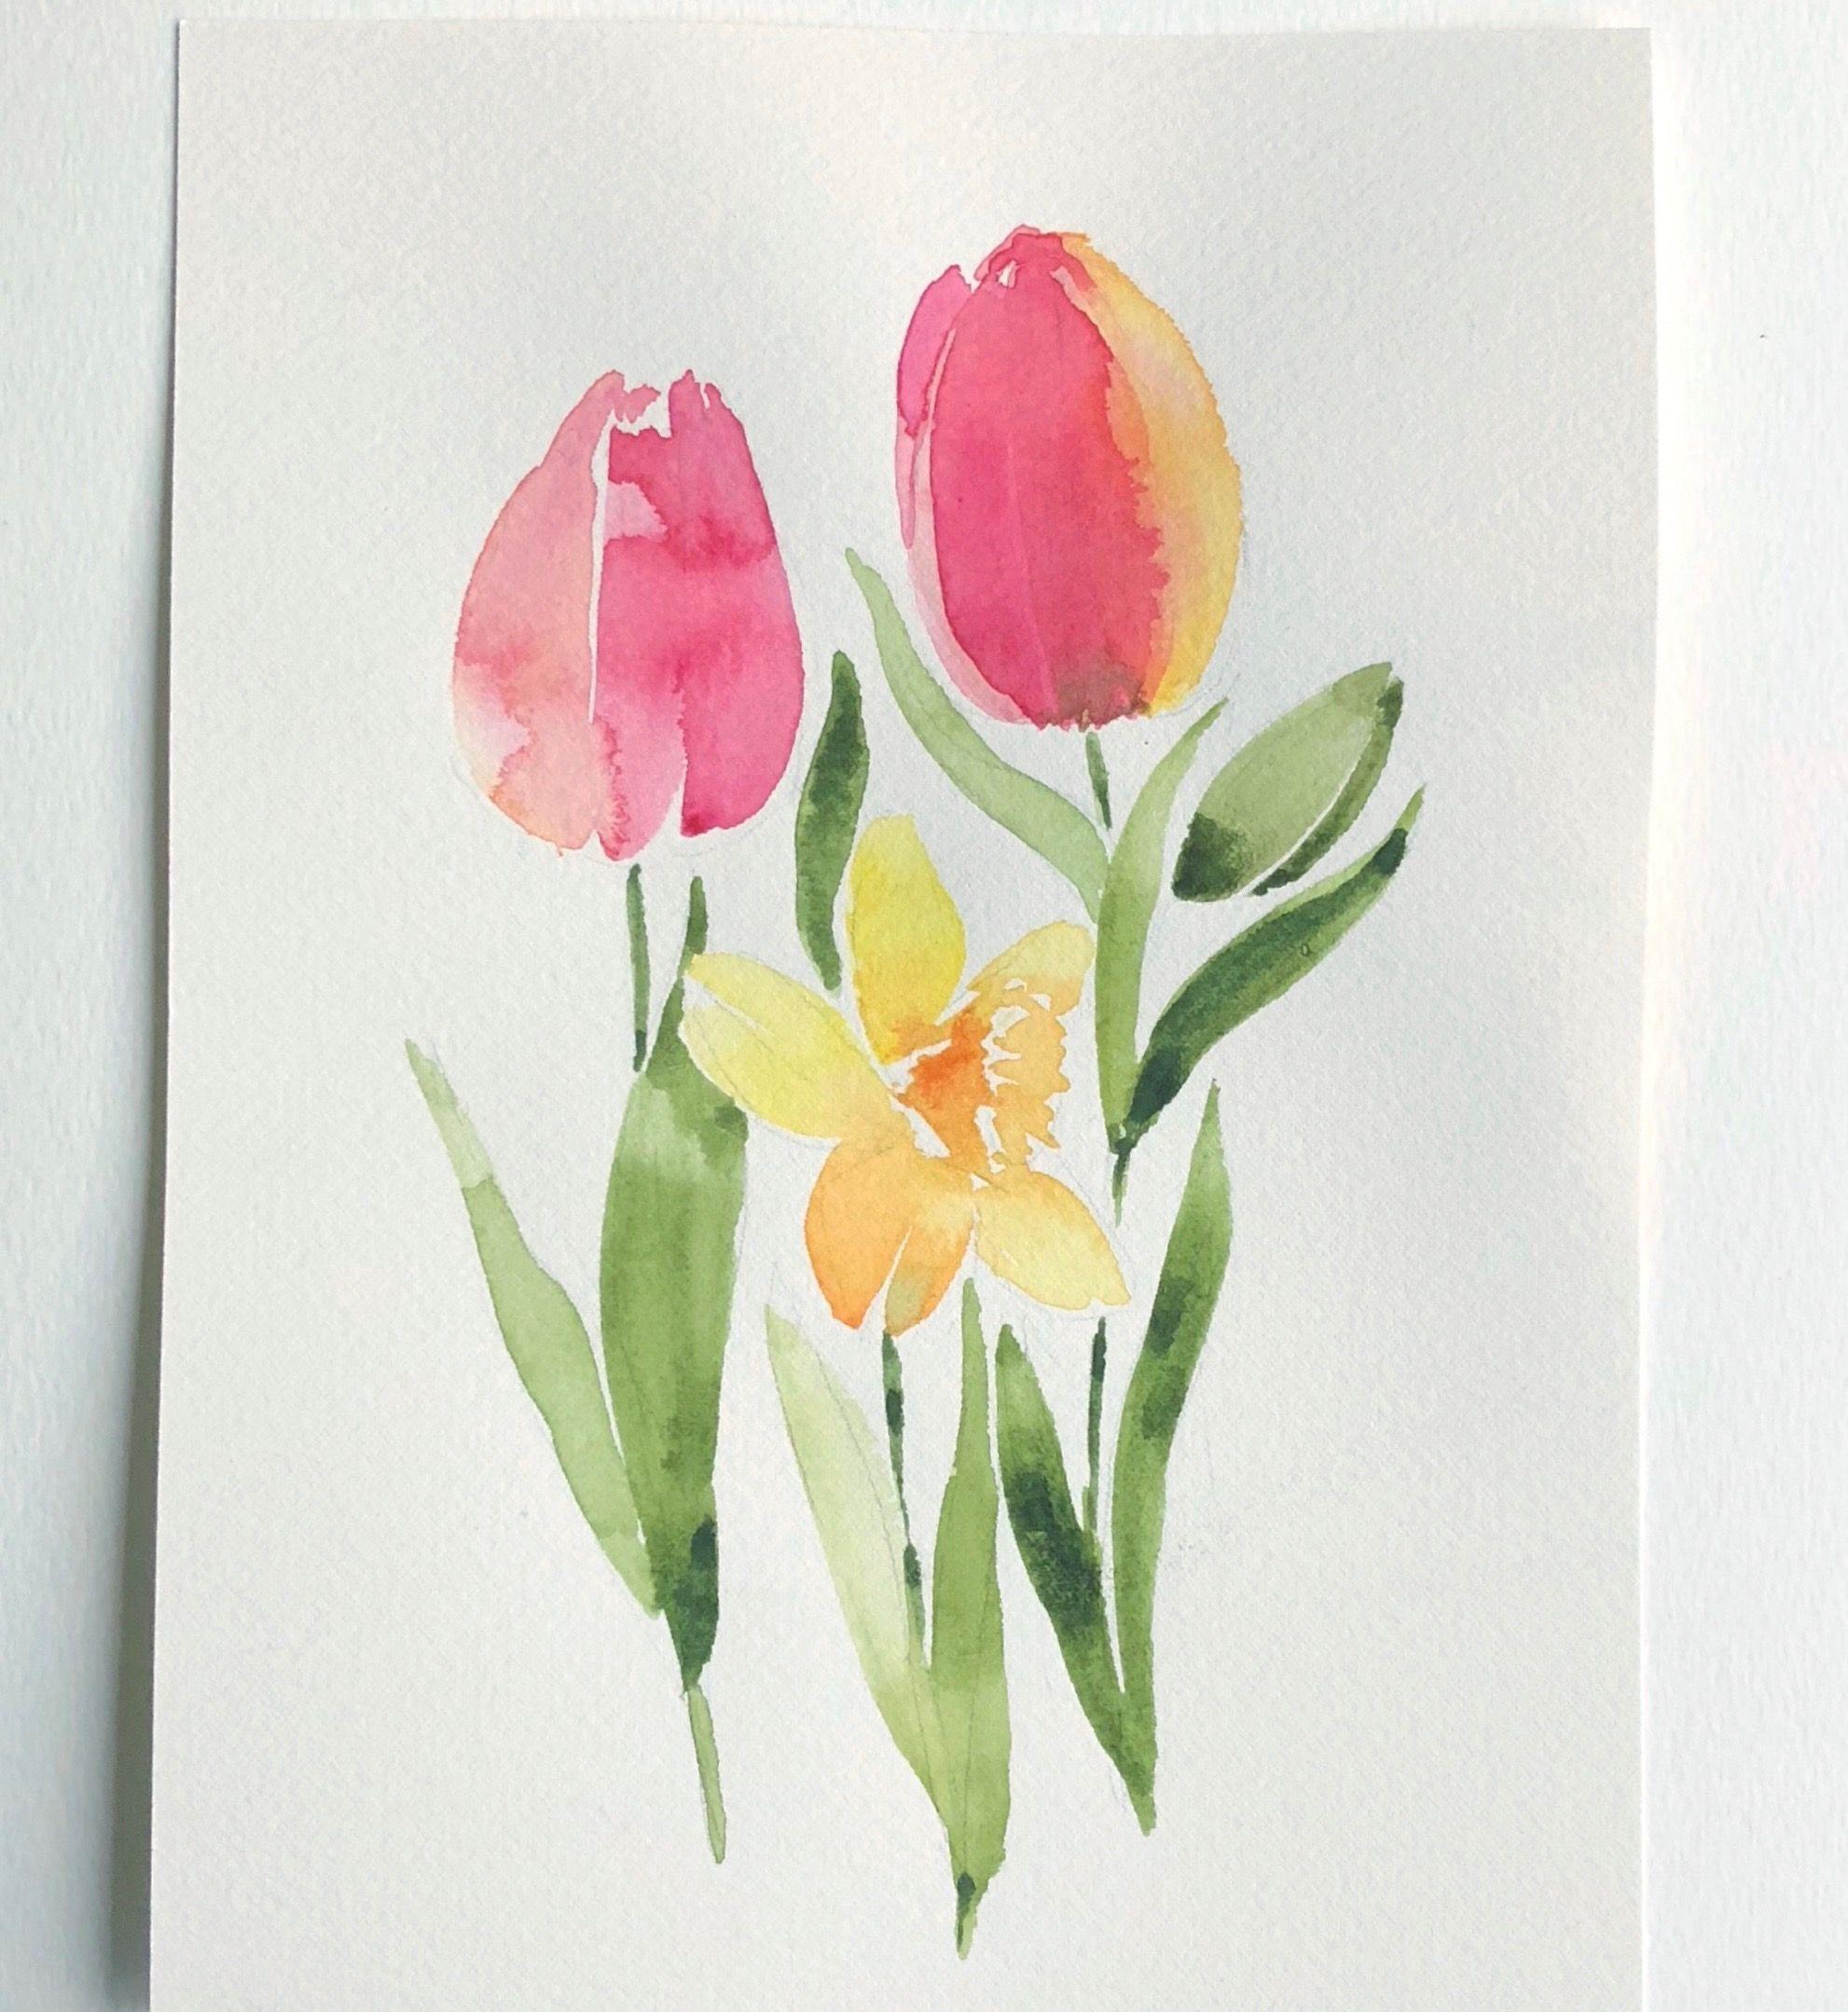 Pin Von Aikaterini Sigoura Auf Karten Blumen Aquarell Aquarell